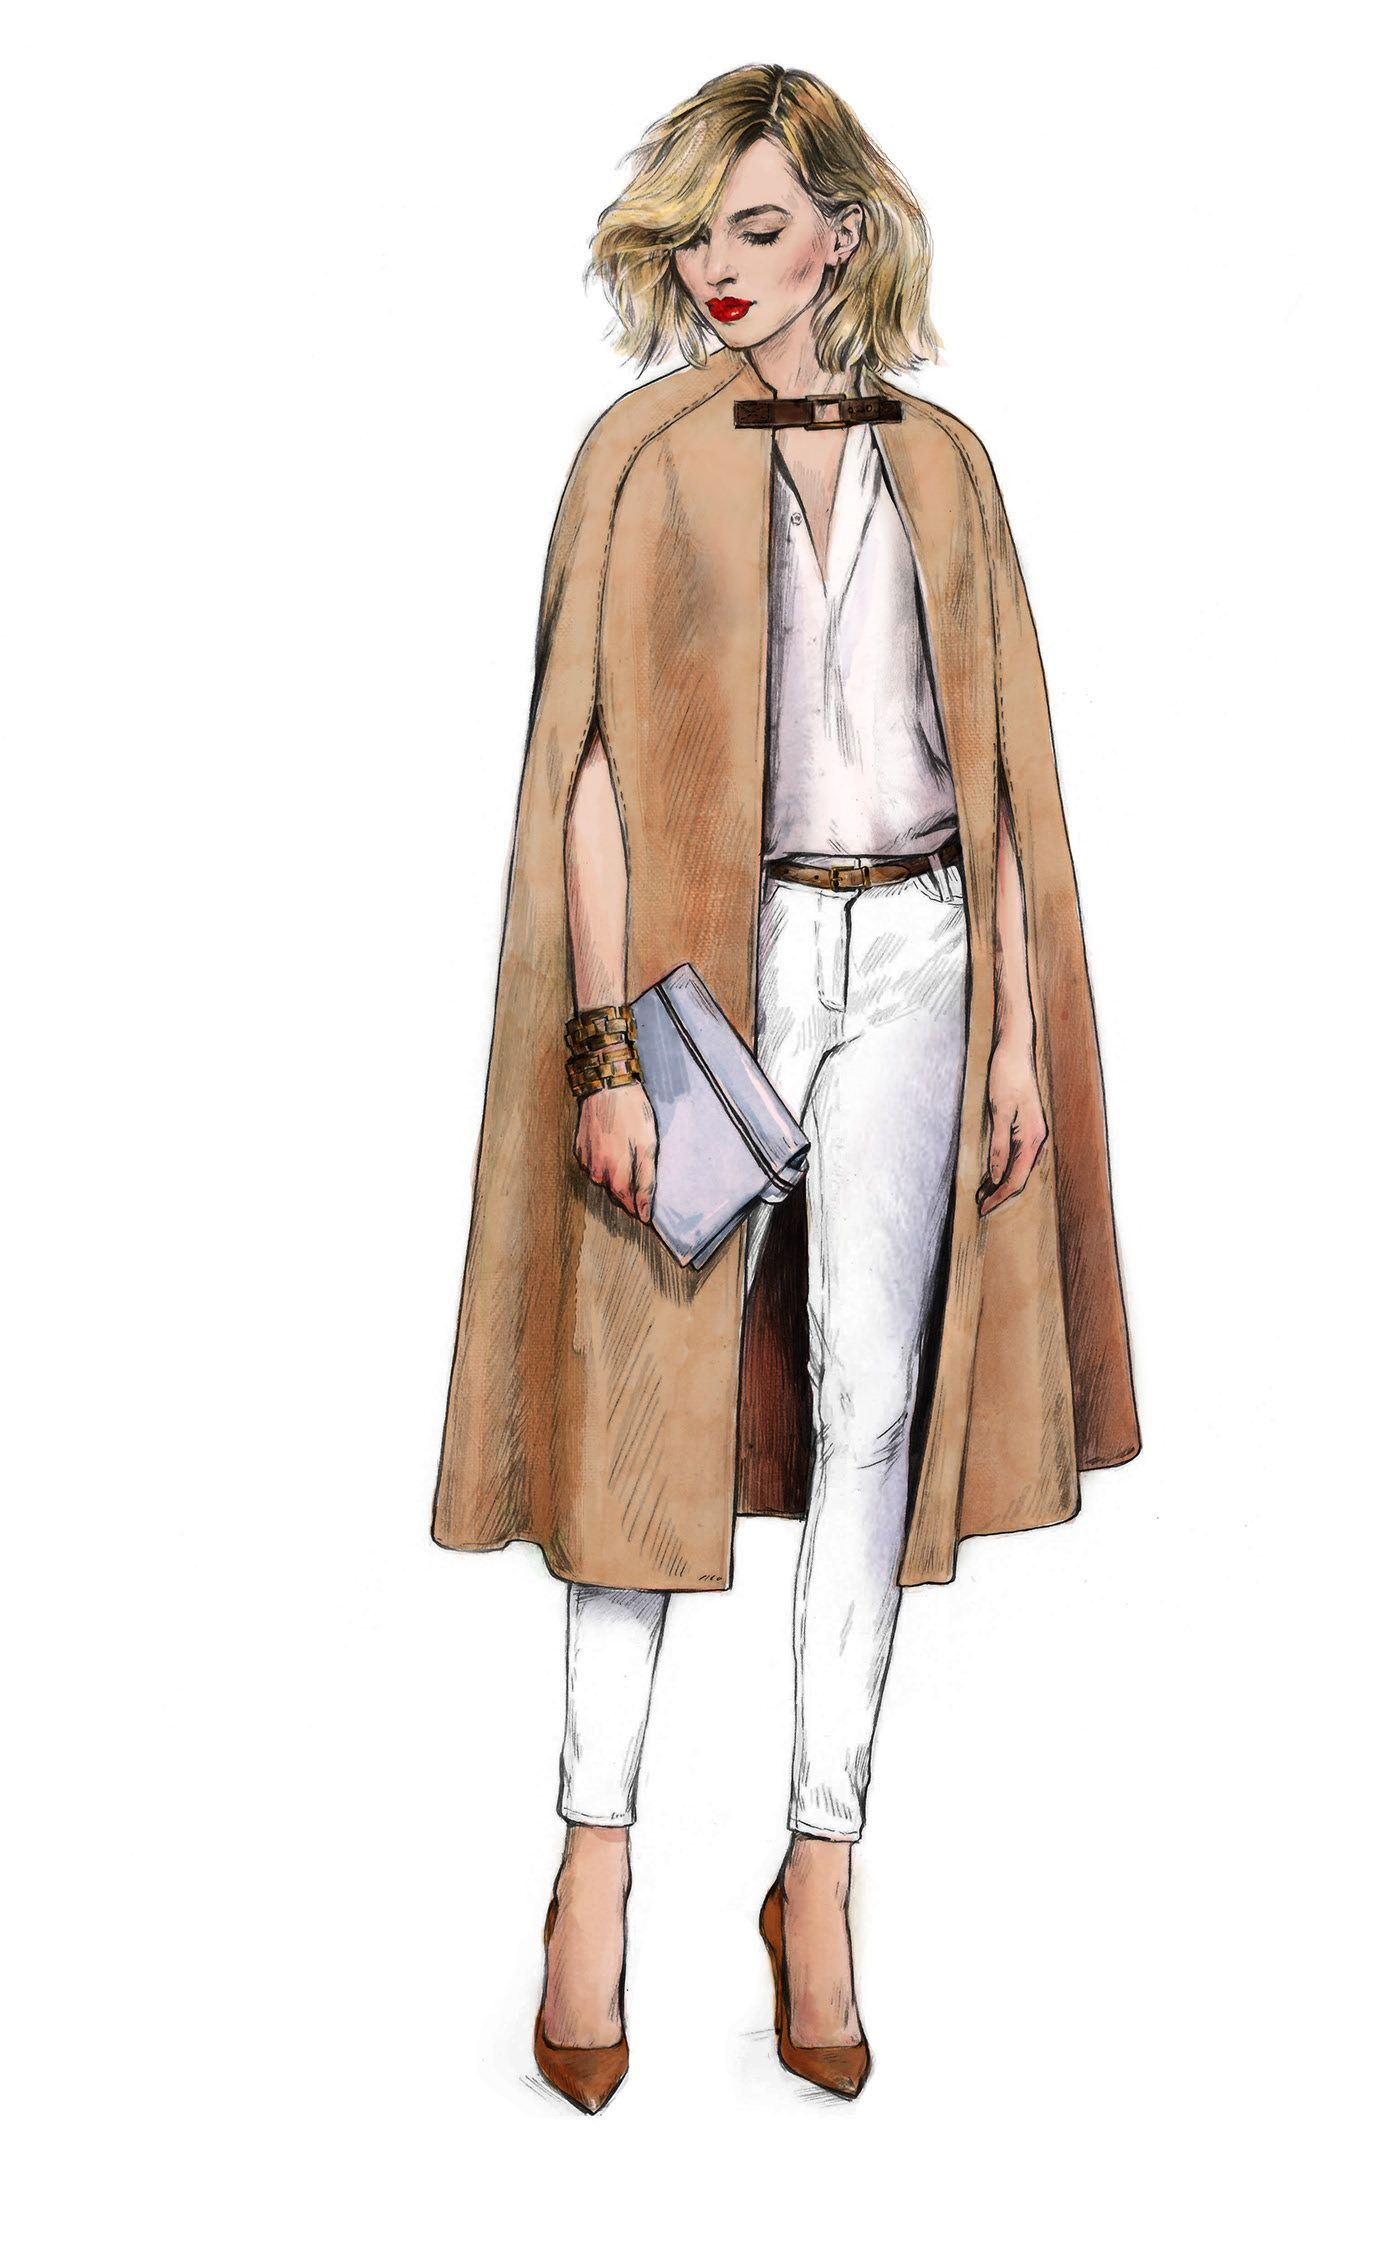 Photo of Illustrations for Casulo Luxury Wear. on Behance #behance #casulo #ilustra #ilu …